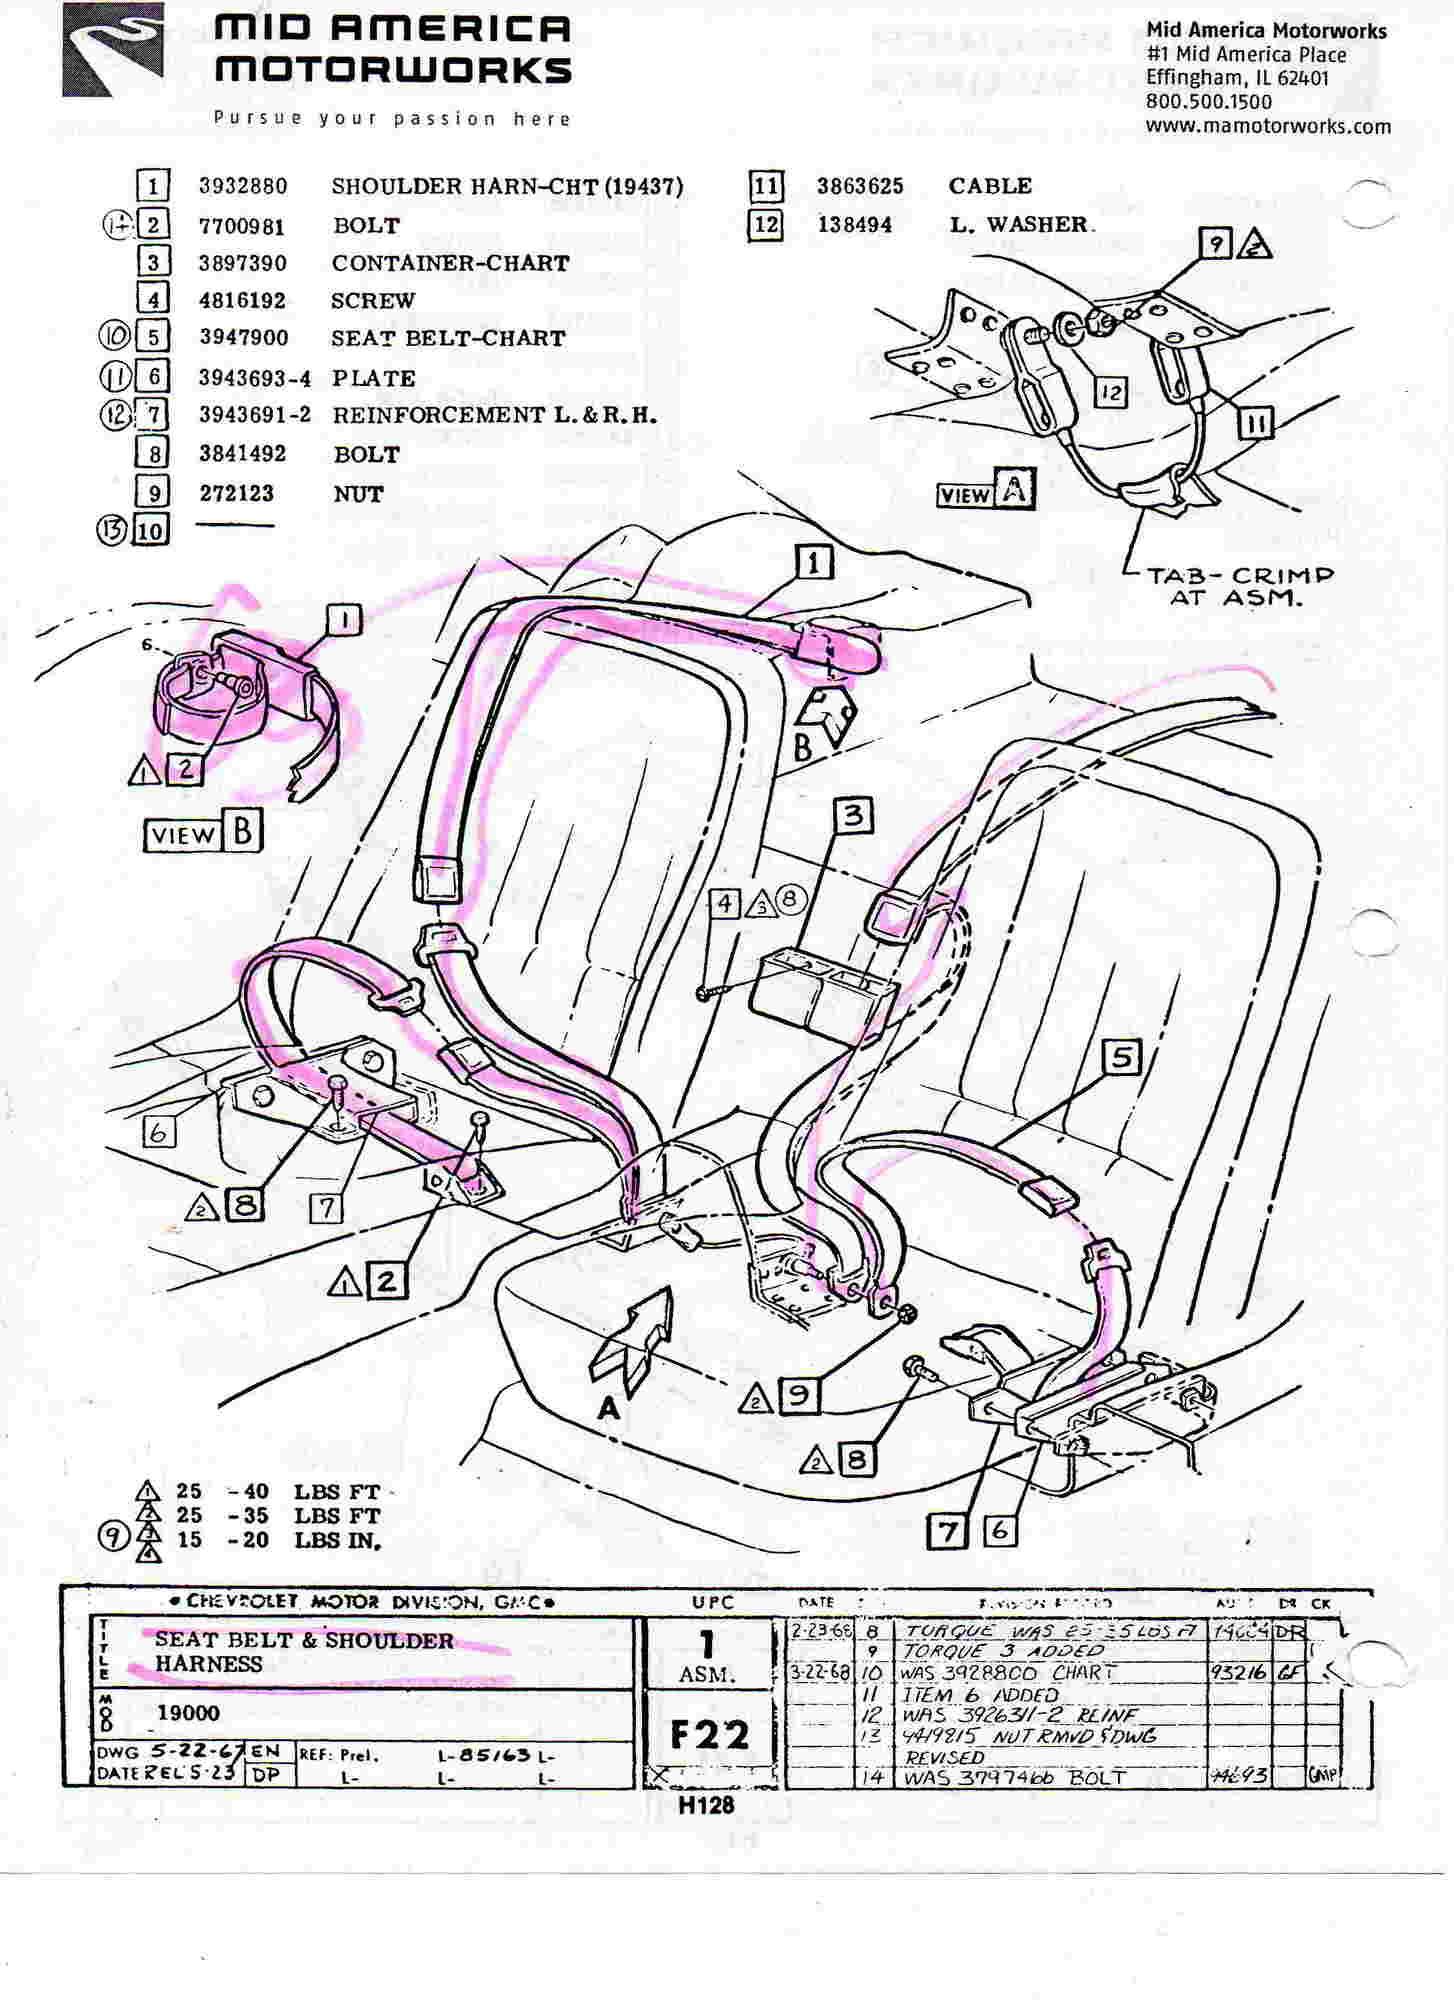 What a dumb question, 1969 seat belt bolt location